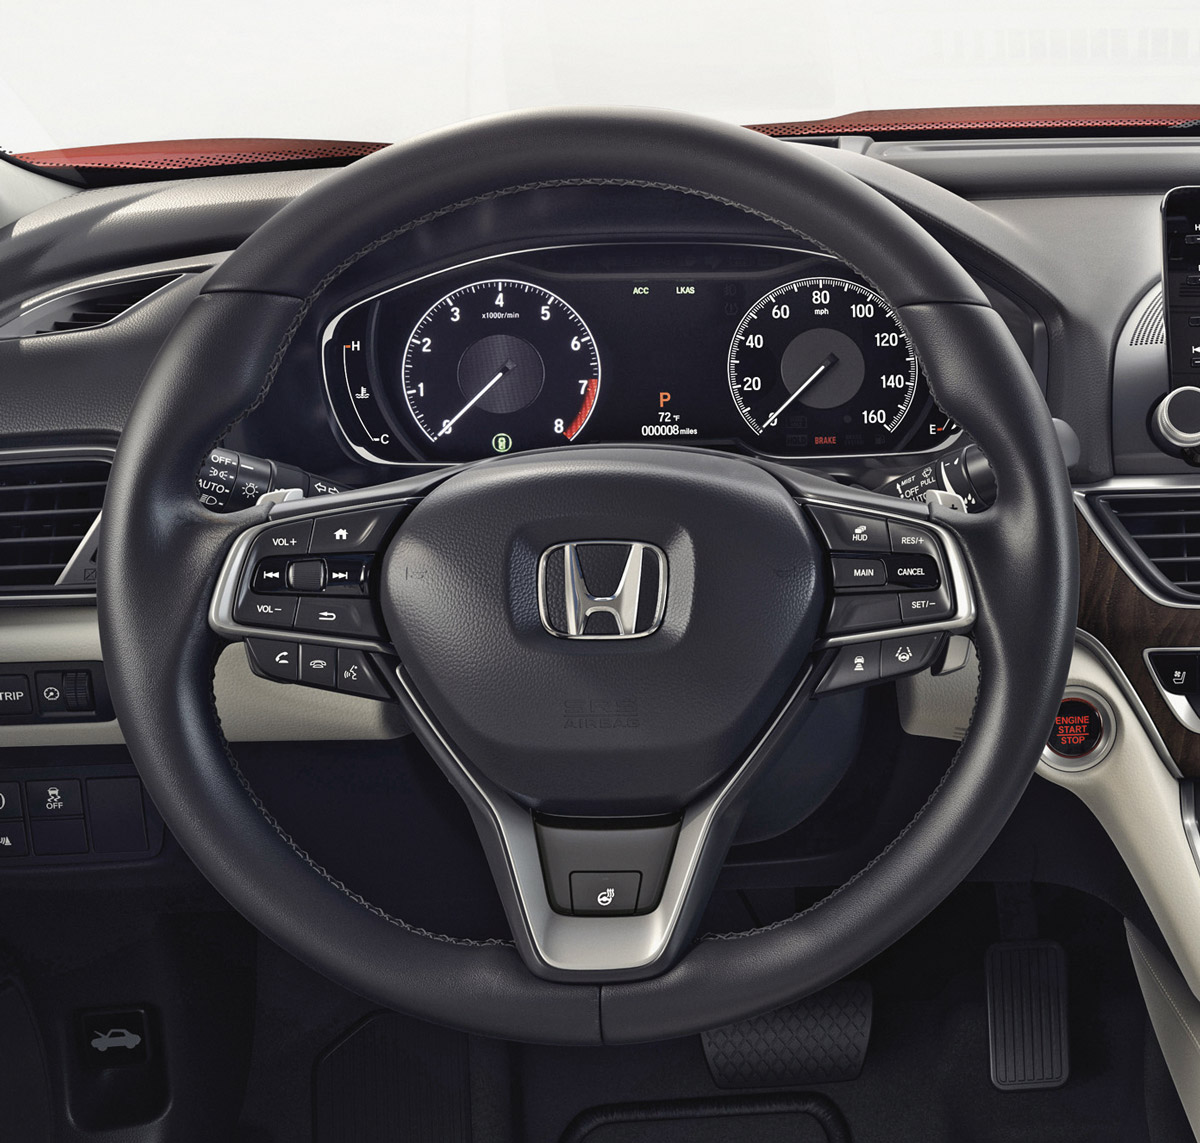 2018 Honda Accord Heated Steering Wheel Wo Paddle